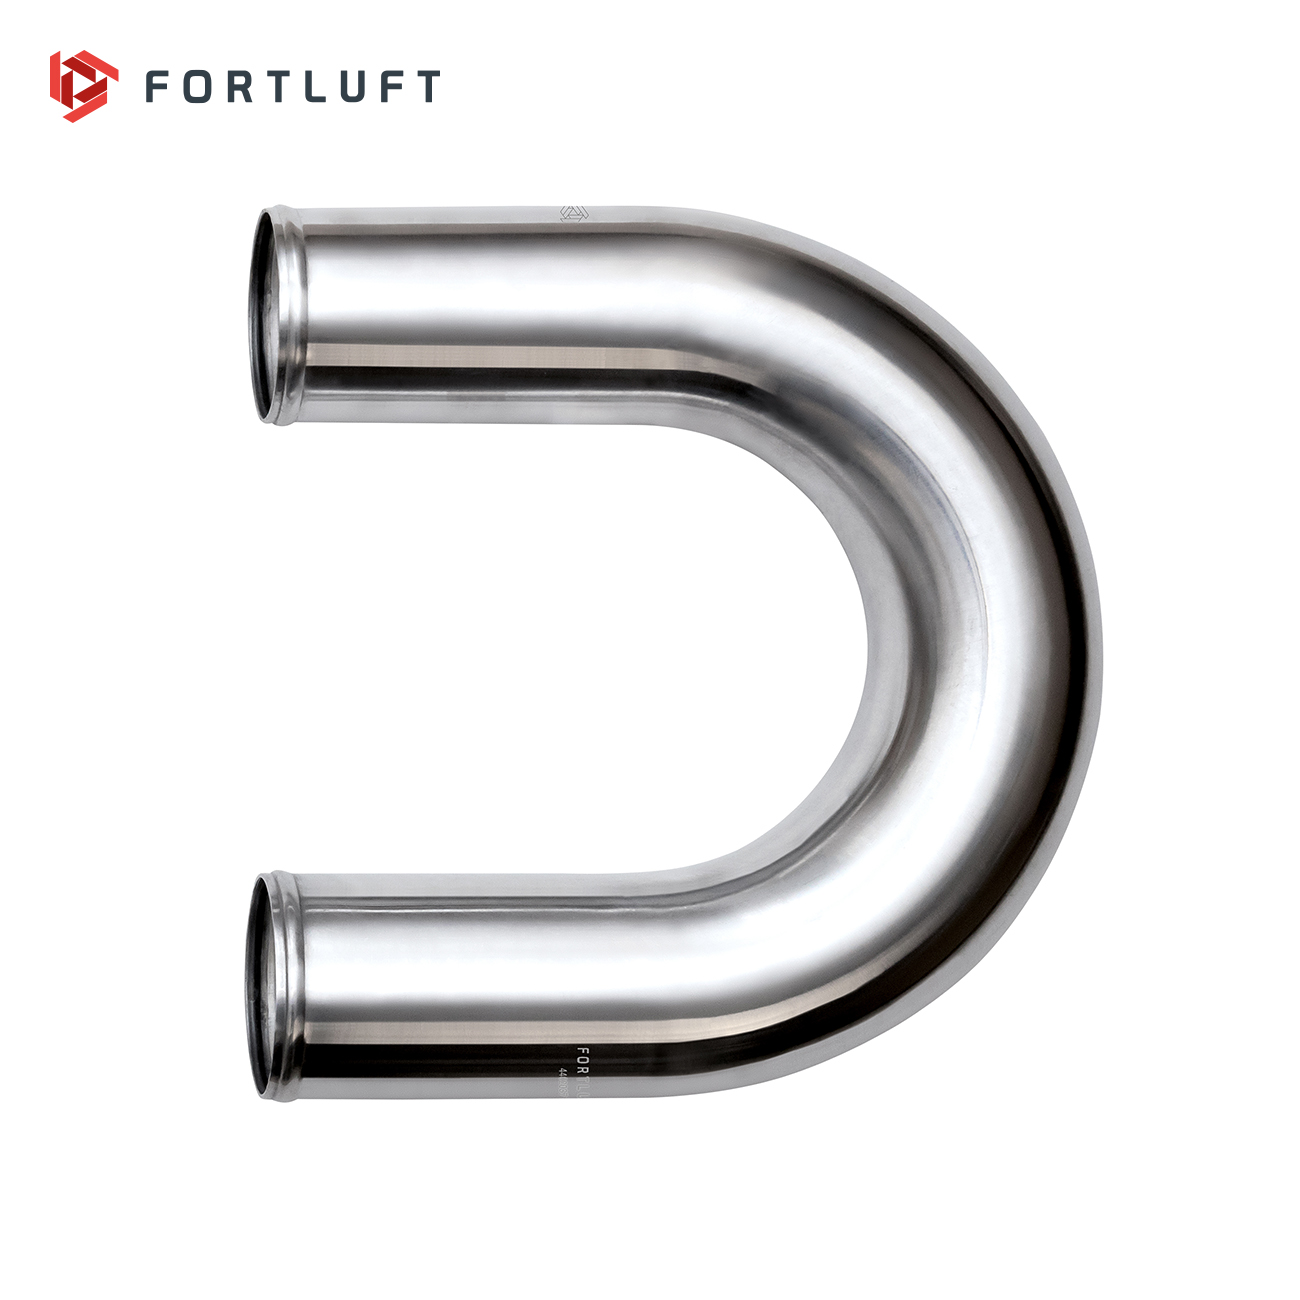 FORTLUFT Universal Turbo Intercooler Piping 180 Degree Aluminum 3.00''/76mm